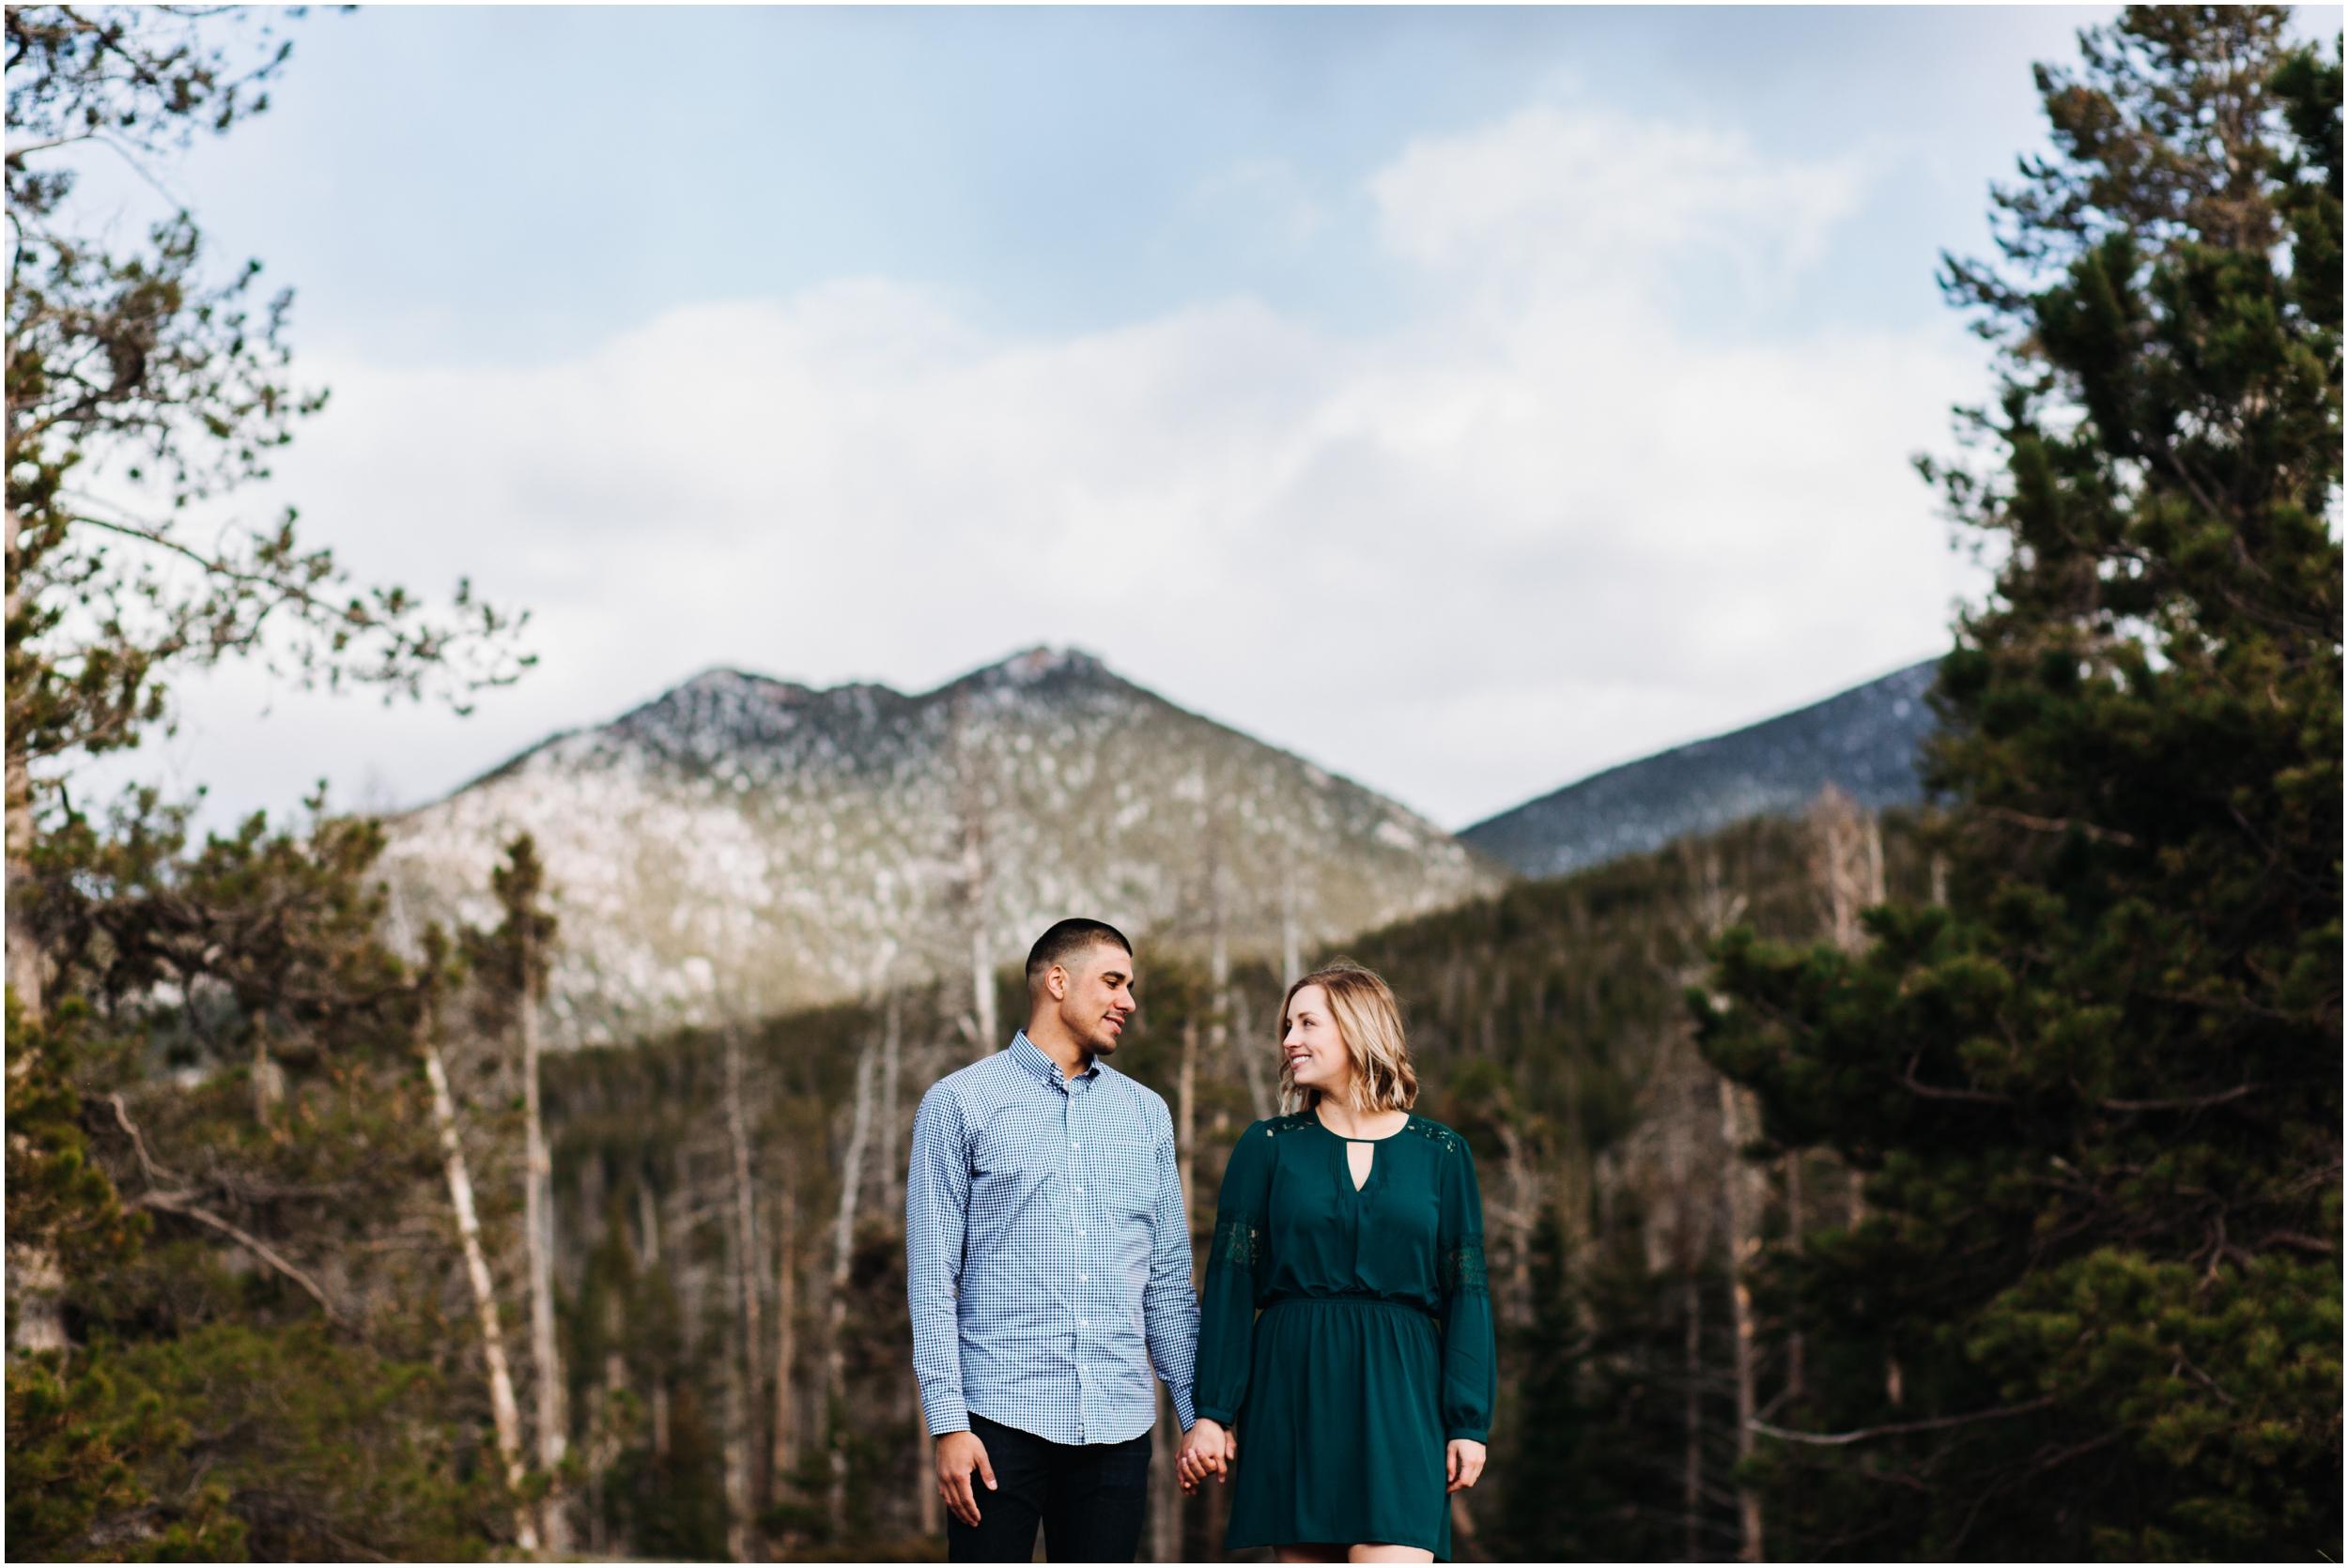 rocky-mountain-national-park-elopement-sprague-lake-colorado-adventure-wedding-photographer_taylor-powers_123.jpg